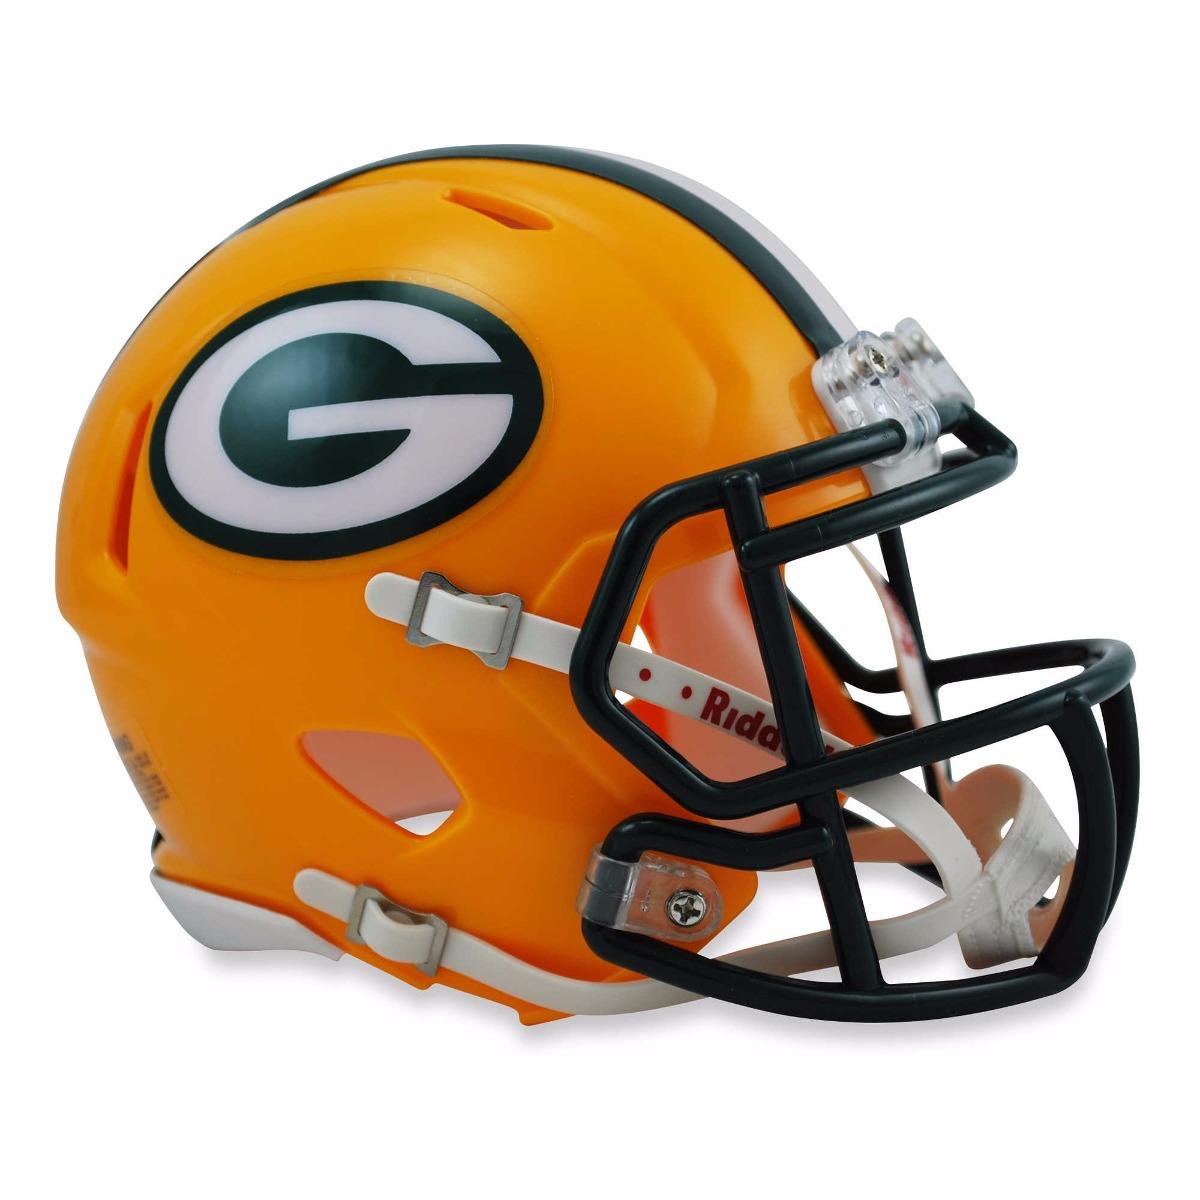 bced30e9bb Mini Capacete Futebol Americano Nfl - Green Bay Packers - R  299